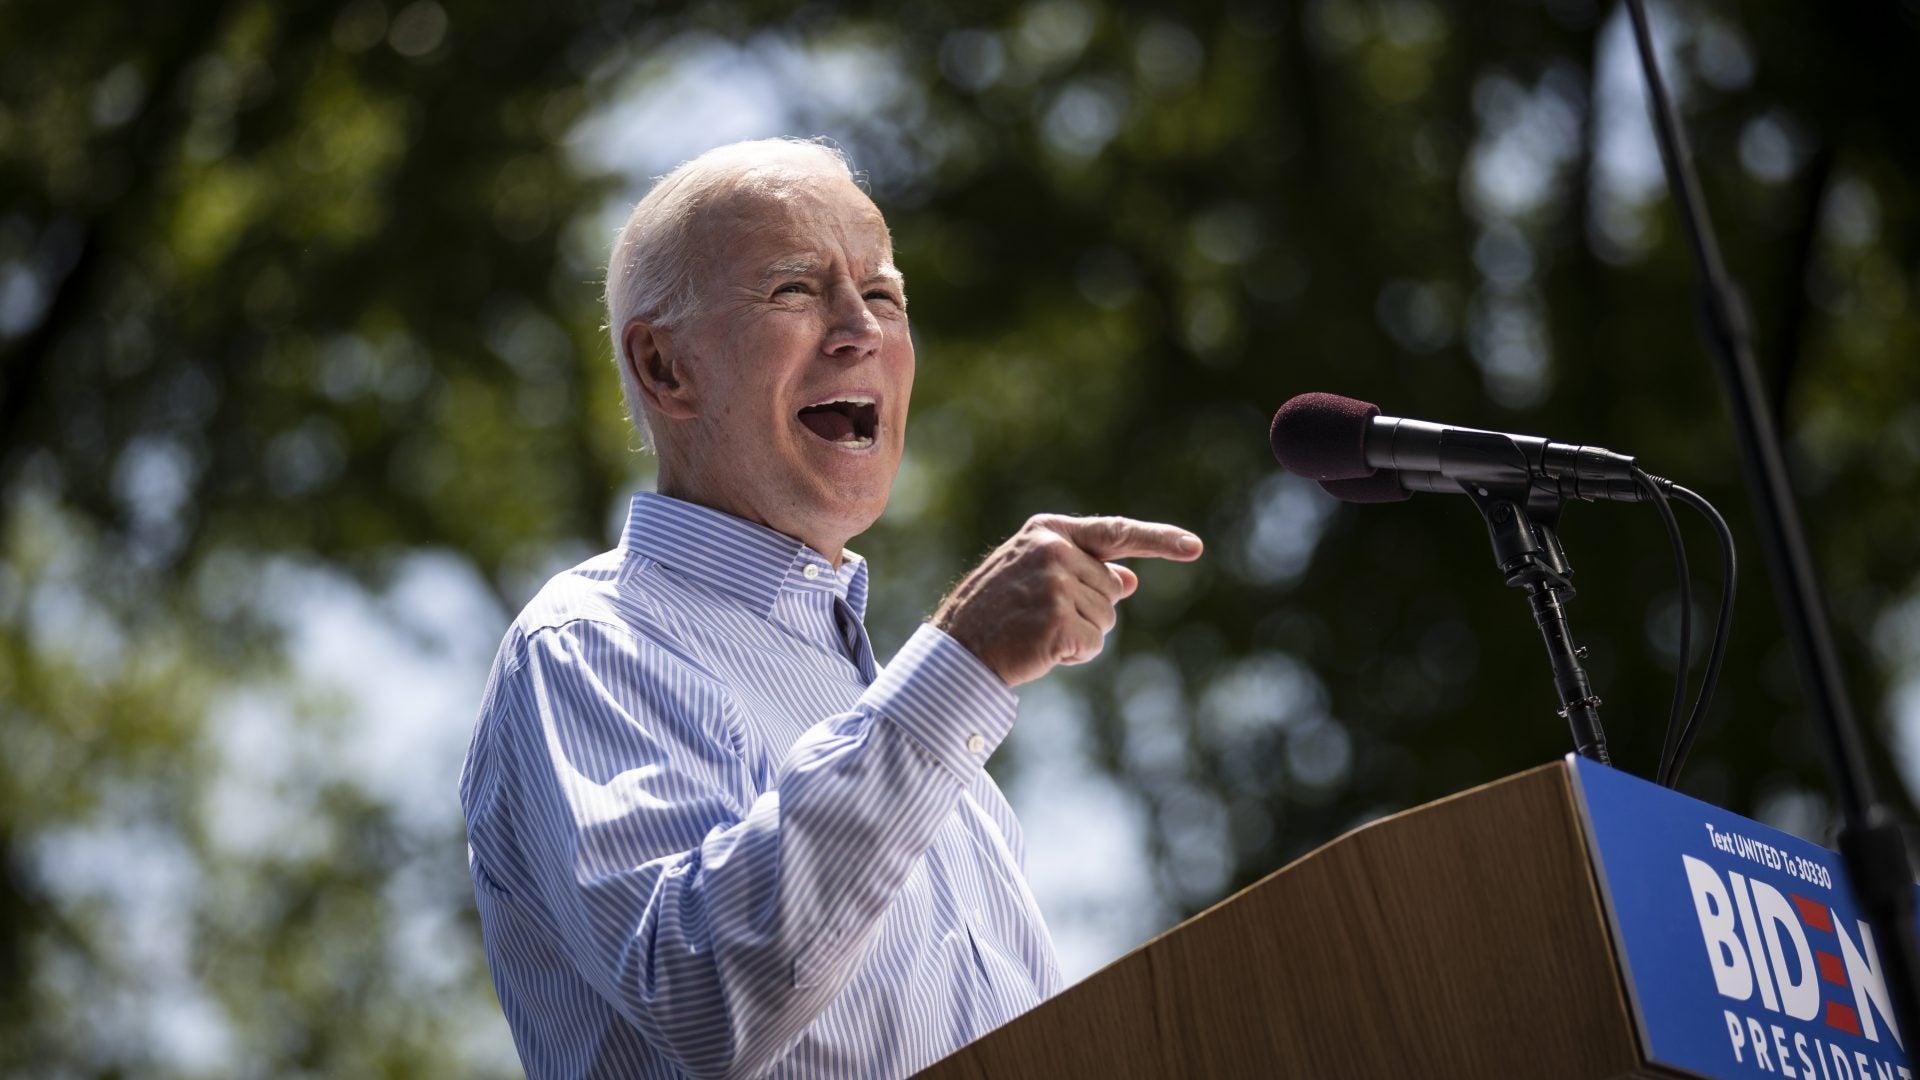 Joe Biden Announces Education Plan To Raise Teacher Pay, Invest In Schools